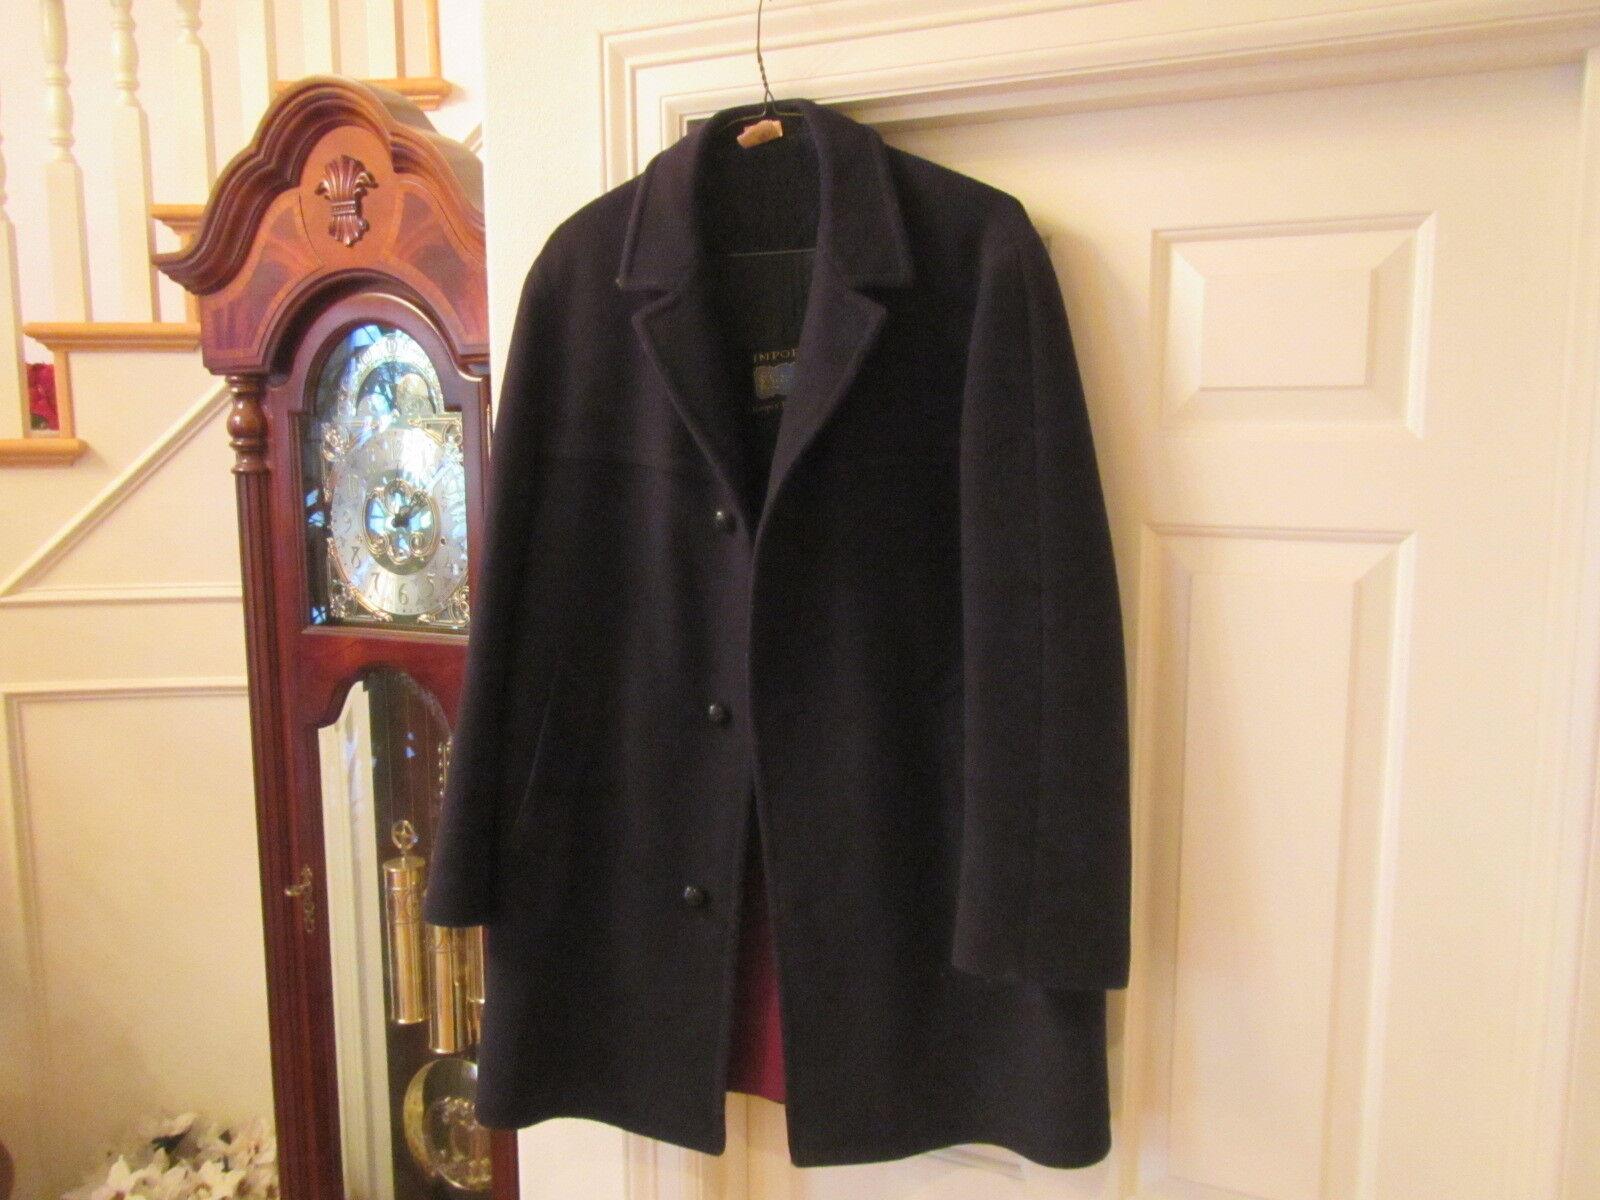 Vintage Wool Herren Dark Navy Loden Wool Vintage Coat Sz L XL Lodenfrey Made in Germany bf9216